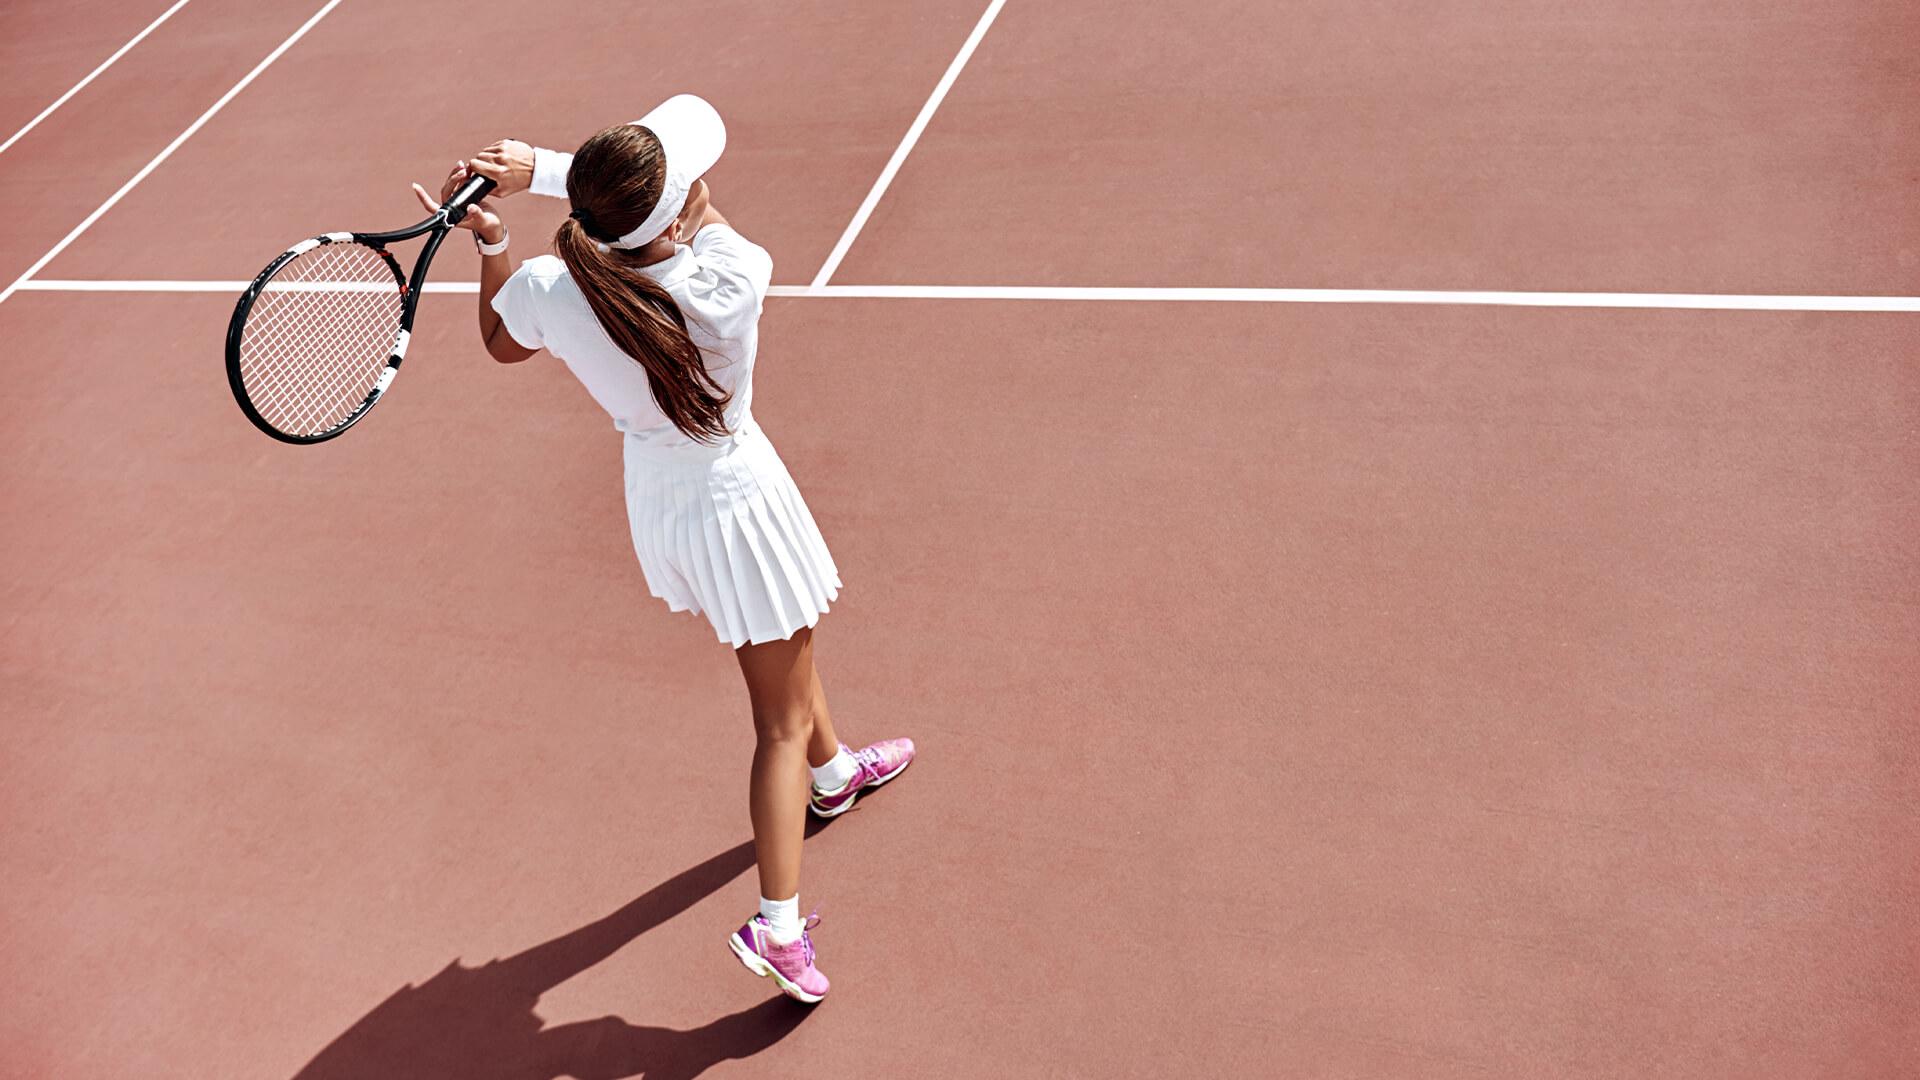 Tenis virtual 458539